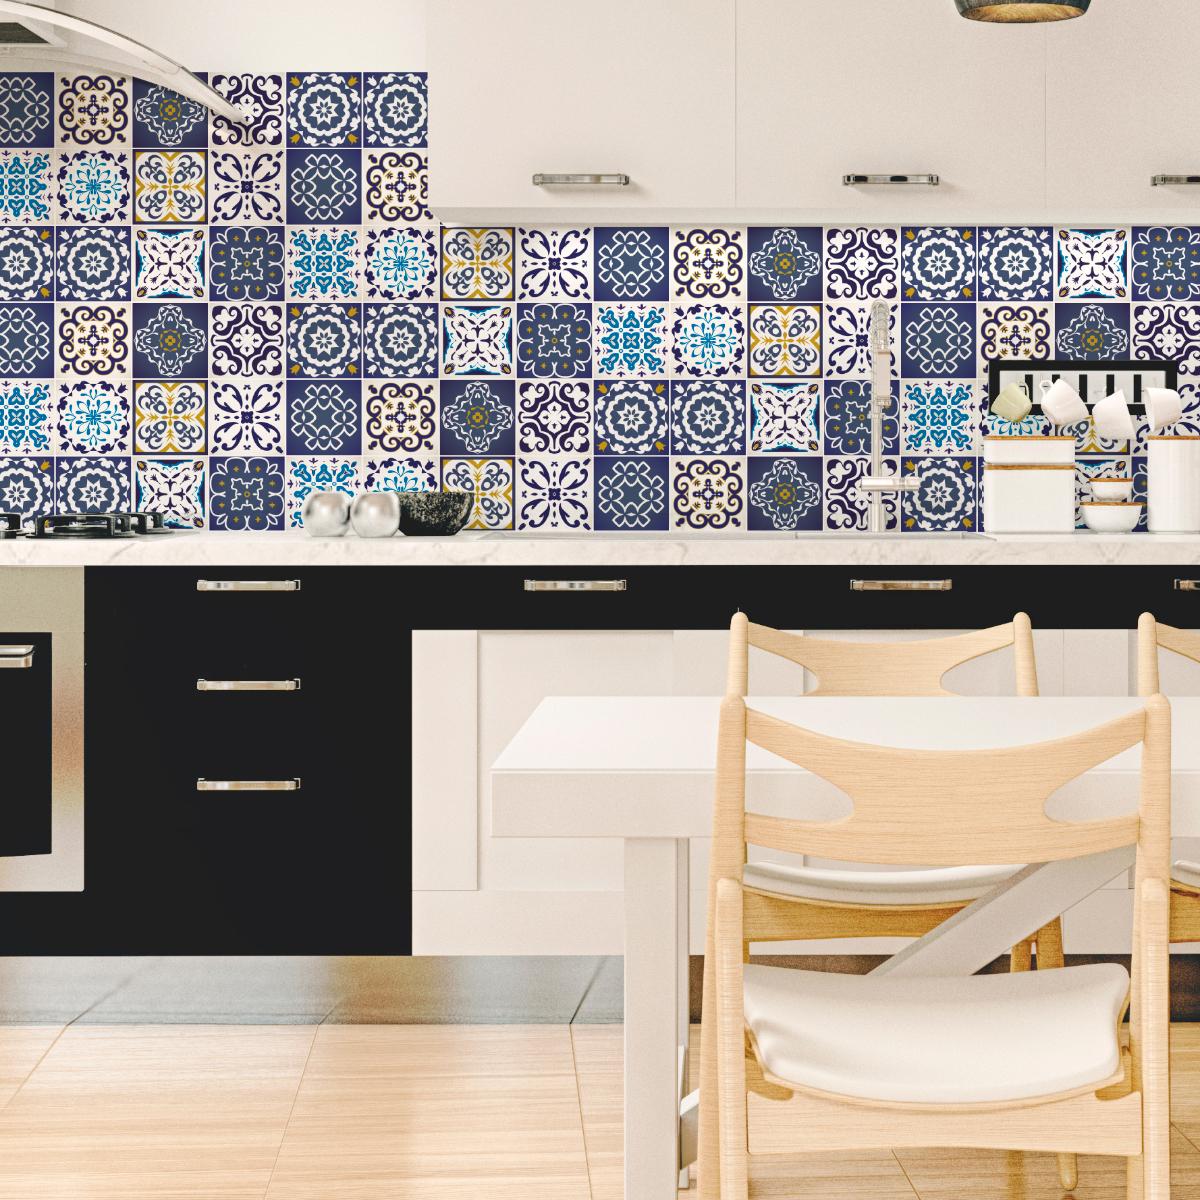 Accessoires Salle De Bain Azulejos ~ 12 stickers carrelages azulejos janeiro salle de bain et wc salle